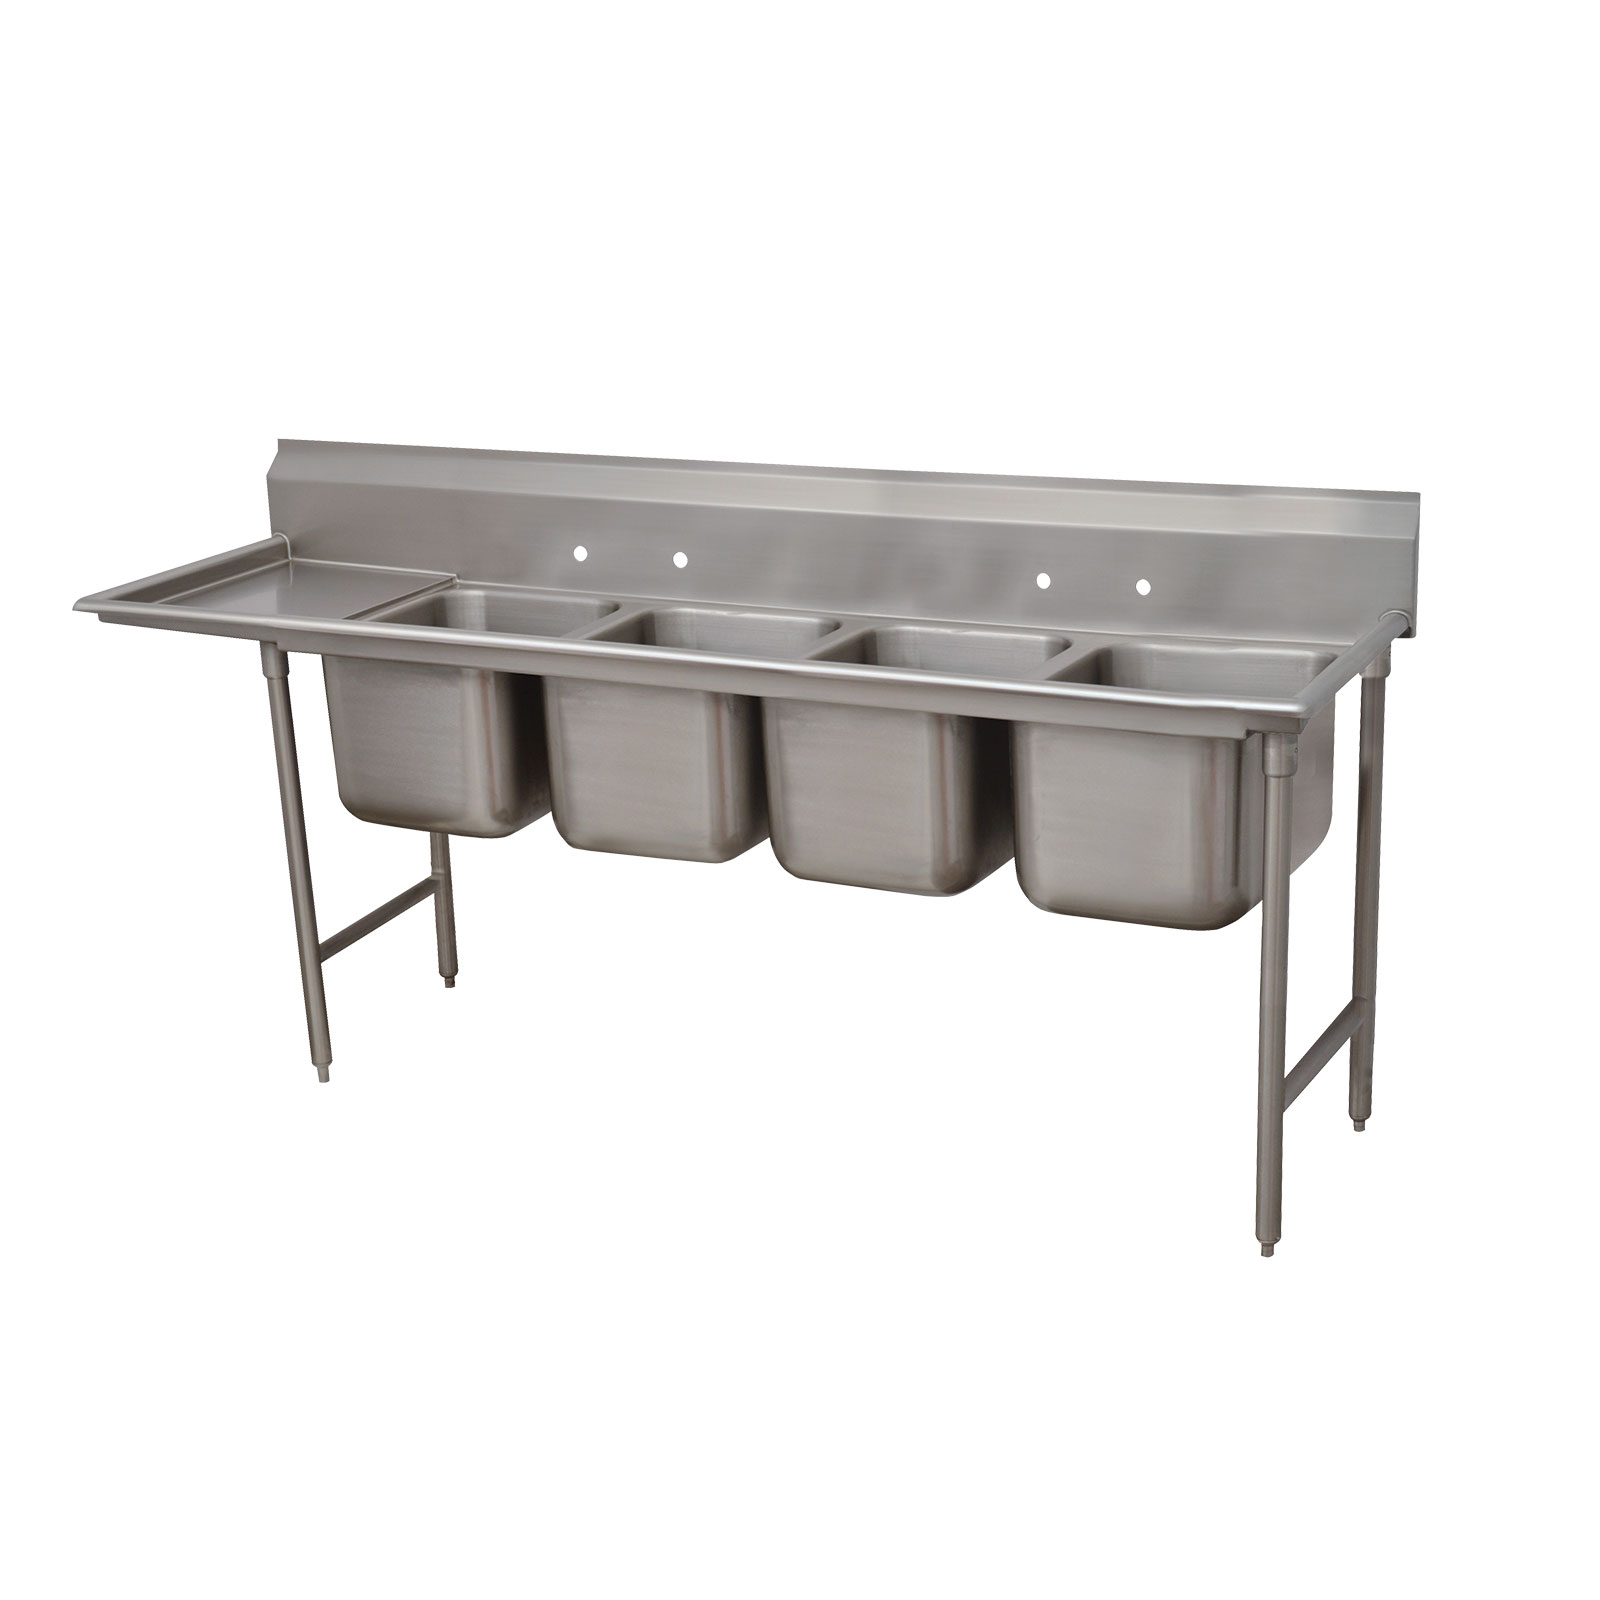 Advance Tabco 9-4-72-18L sink, (4) four compartment